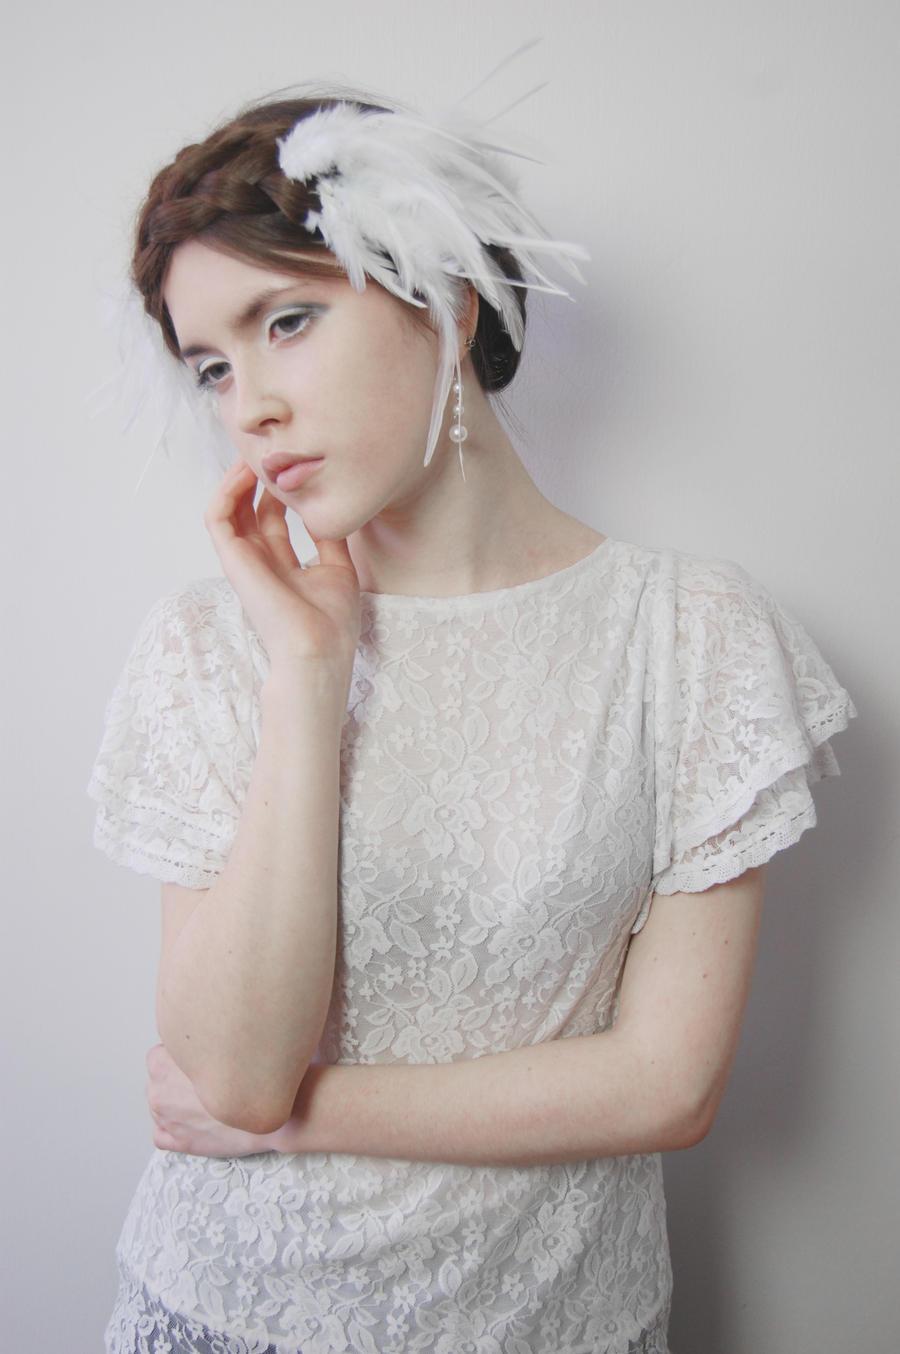 White Swan 10 by Kechake-stock